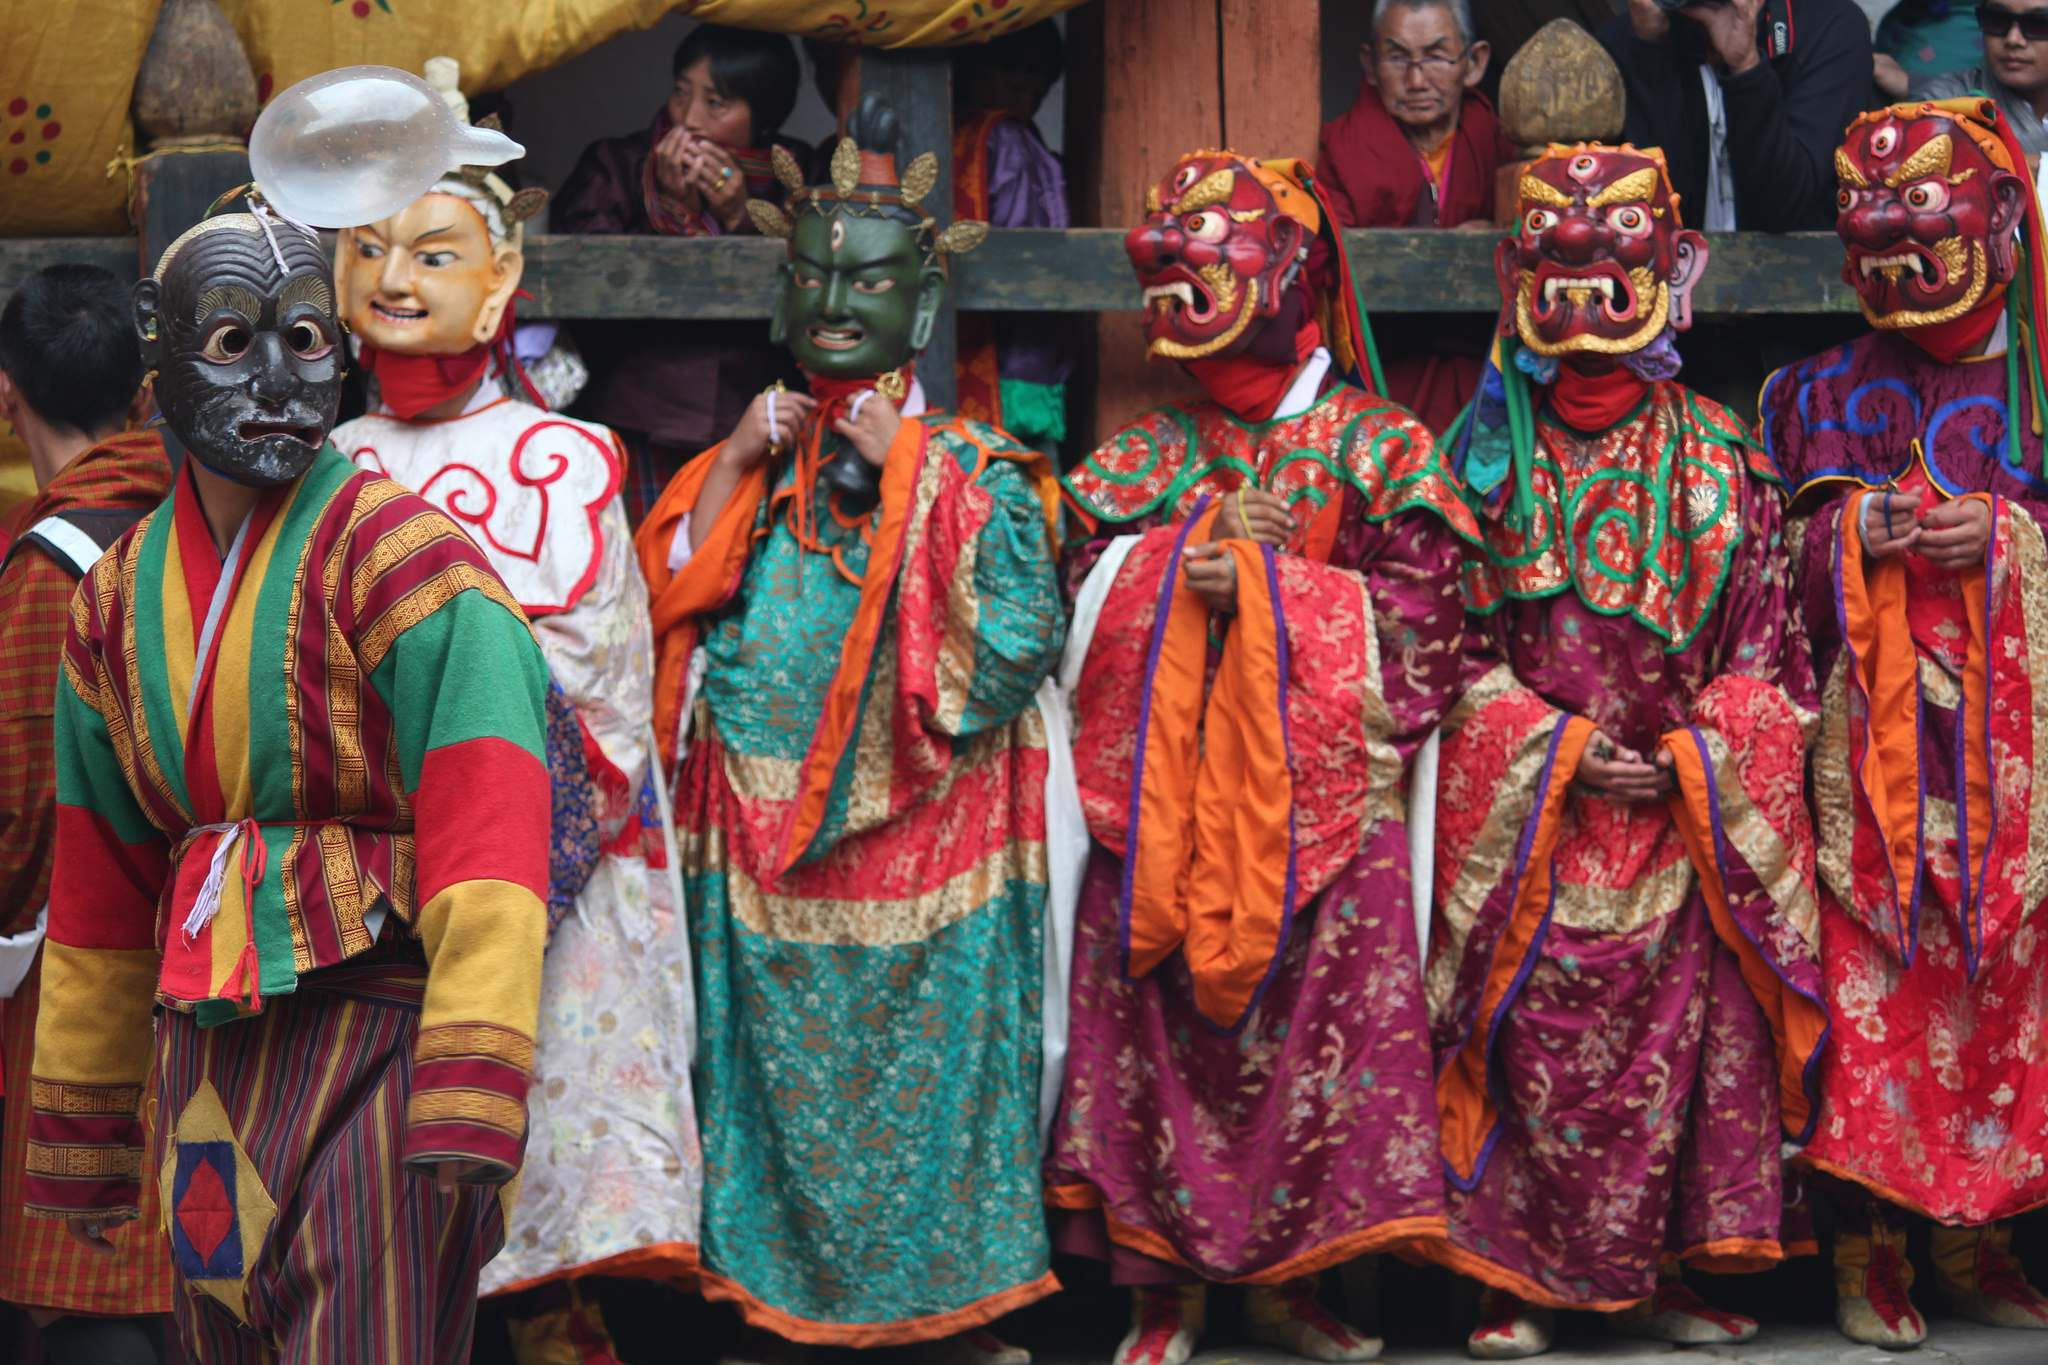 bhutan18 Bhutan   The Land of the Thunder Dragon